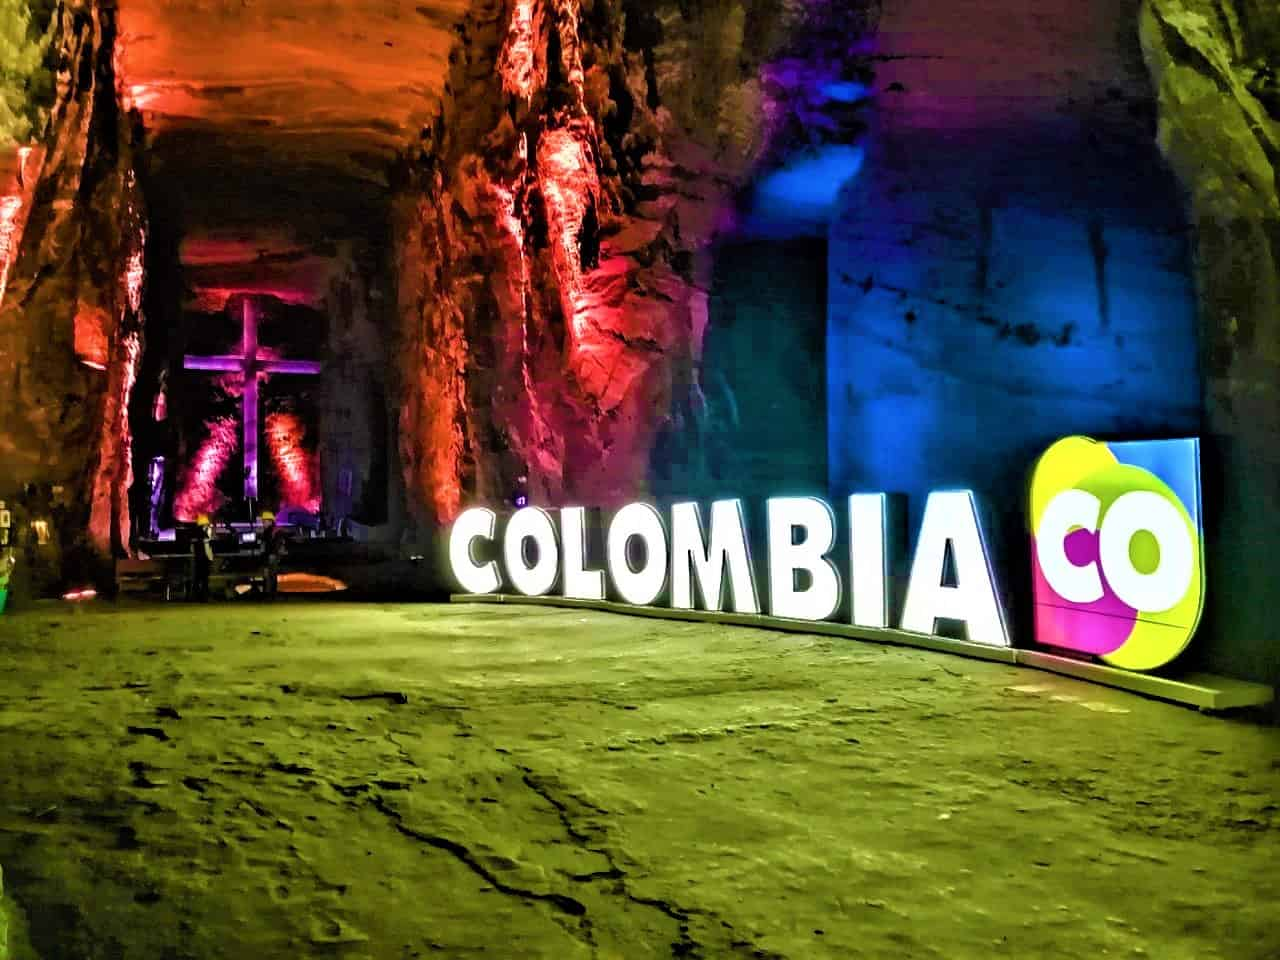 COLOMBIA_CO mejor marca país Latinoamérica